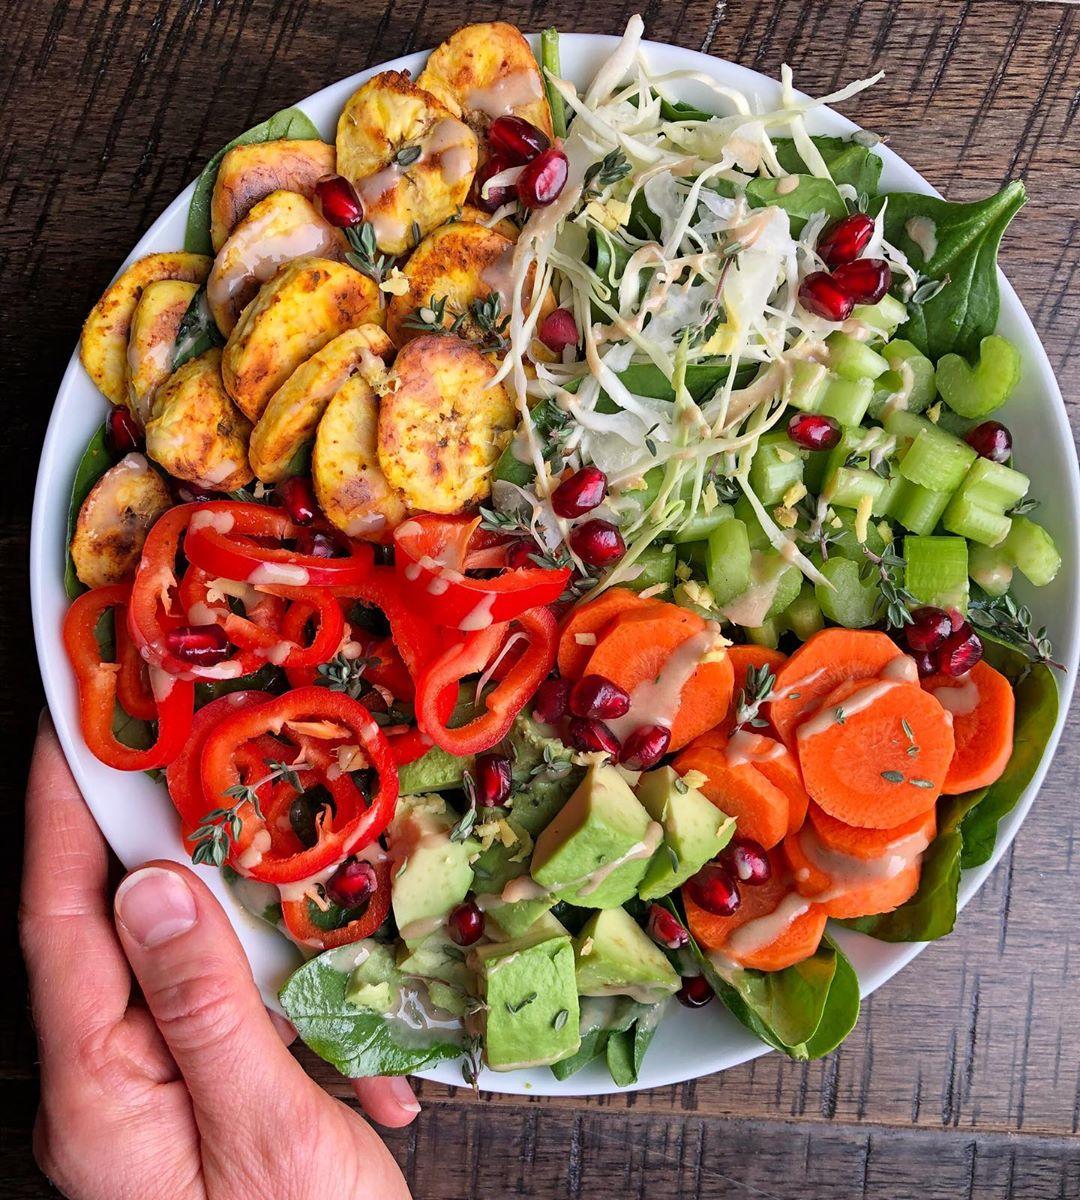 Plátanos al horno con diversas verduras